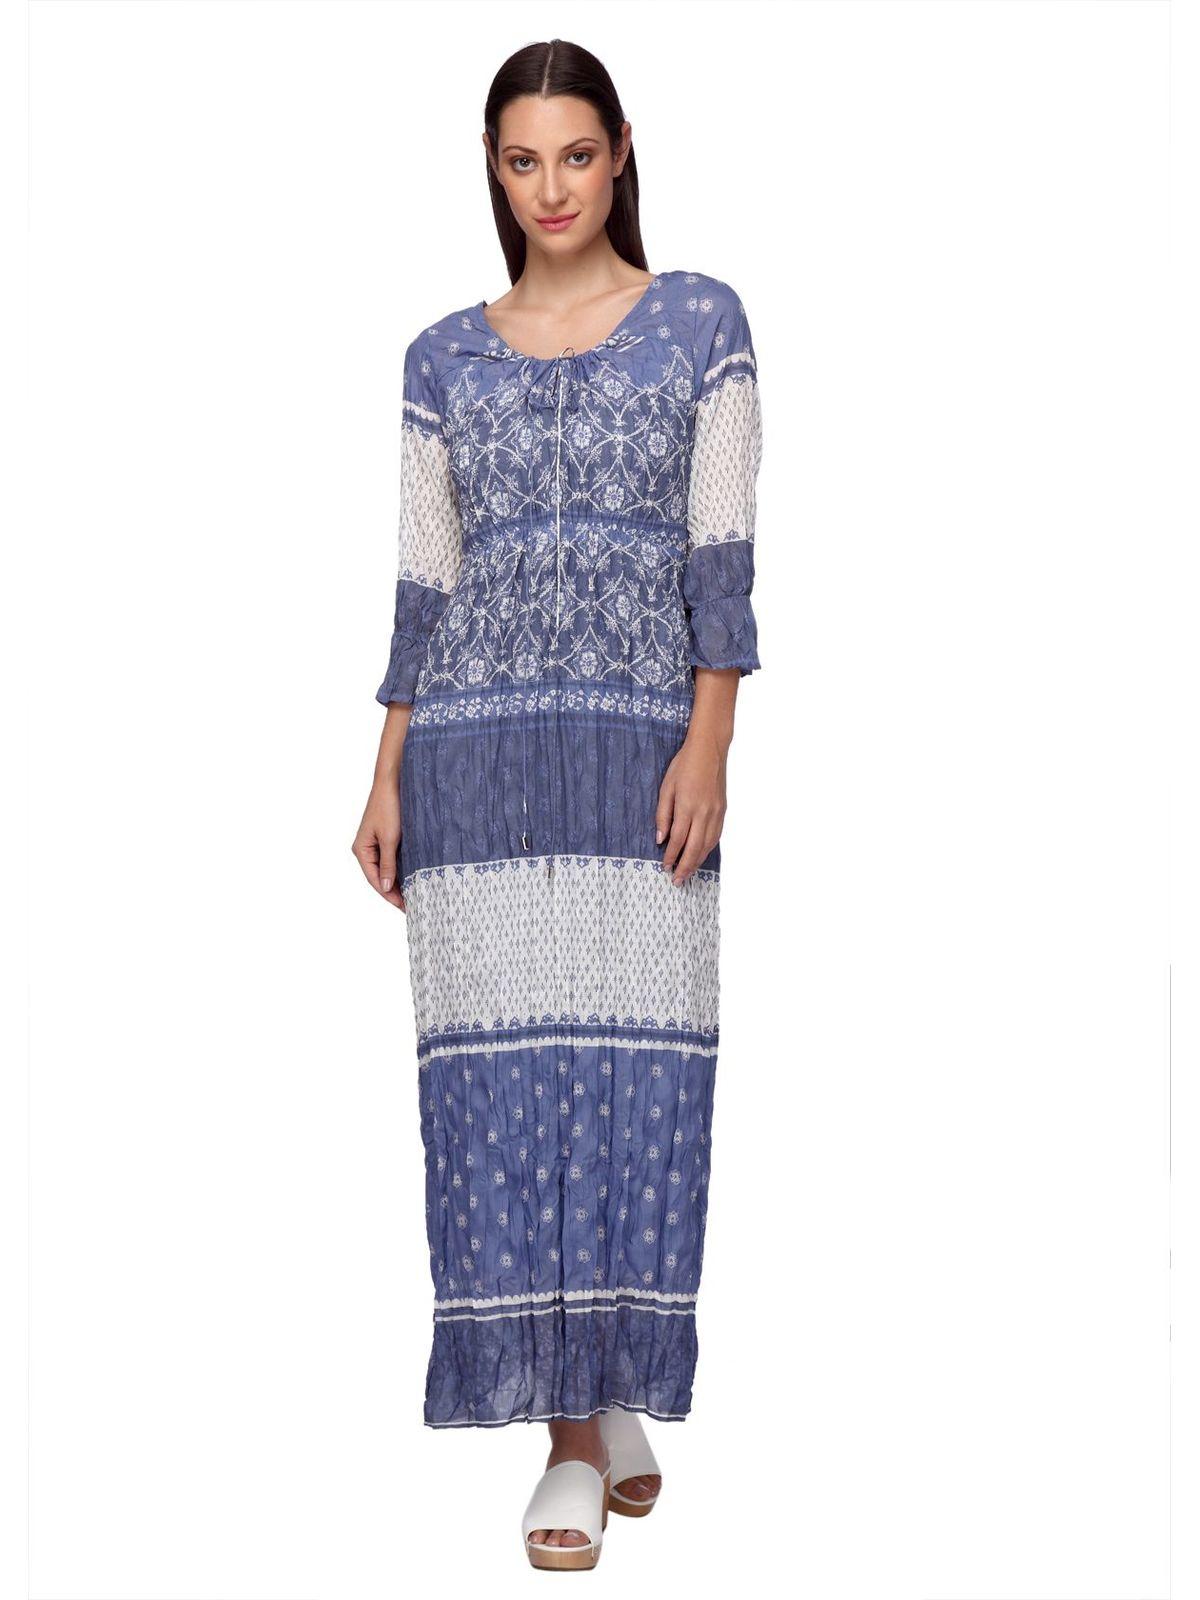 ALICIA BOHO MAXI DRESS